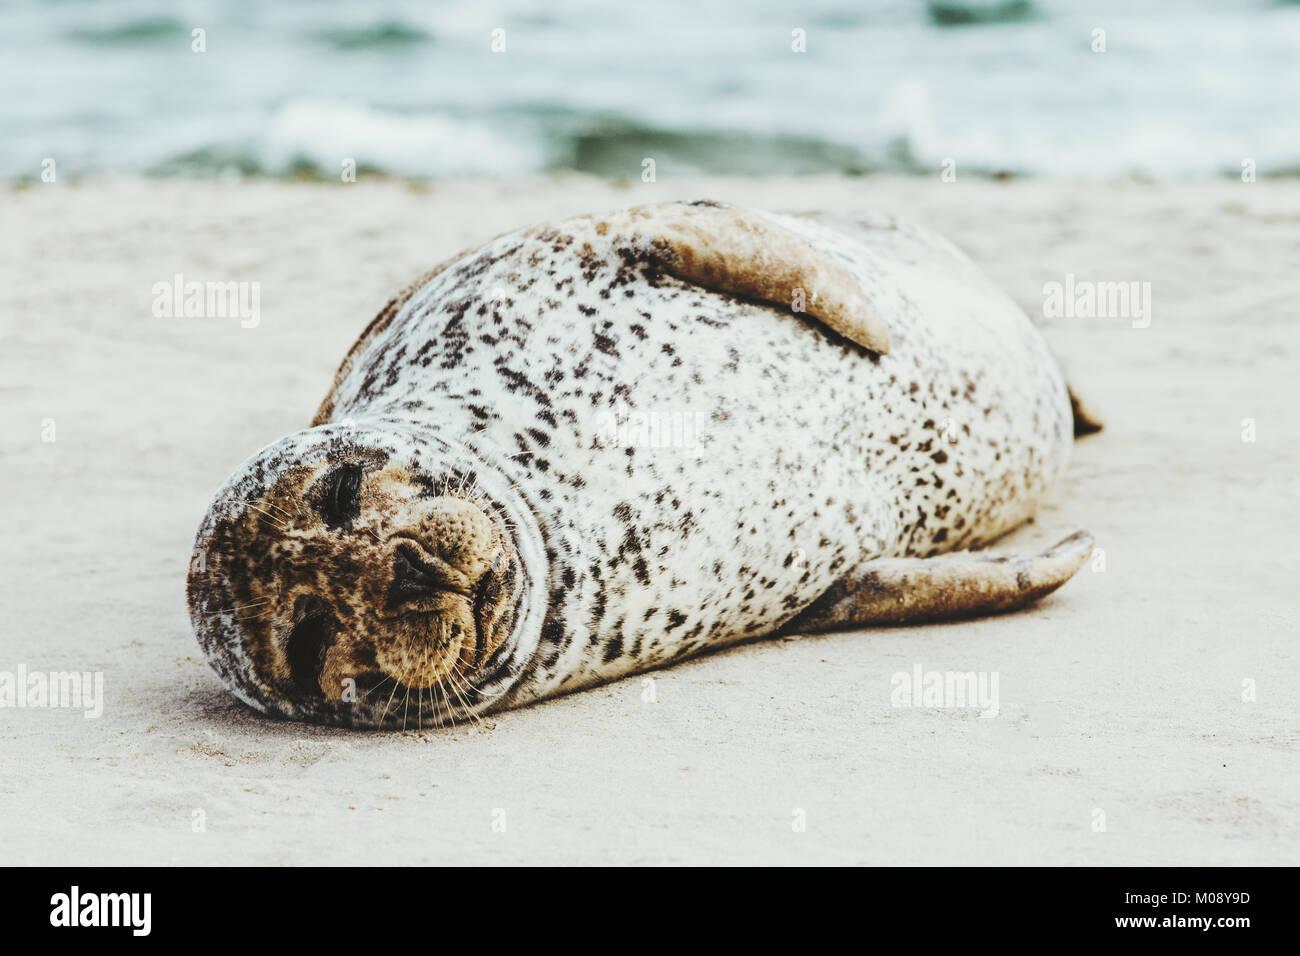 Harbor Seal funny animal sleeping on sandy beach in Denmark phoca vitulina ecology protection concept arctic sealife - Stock Image